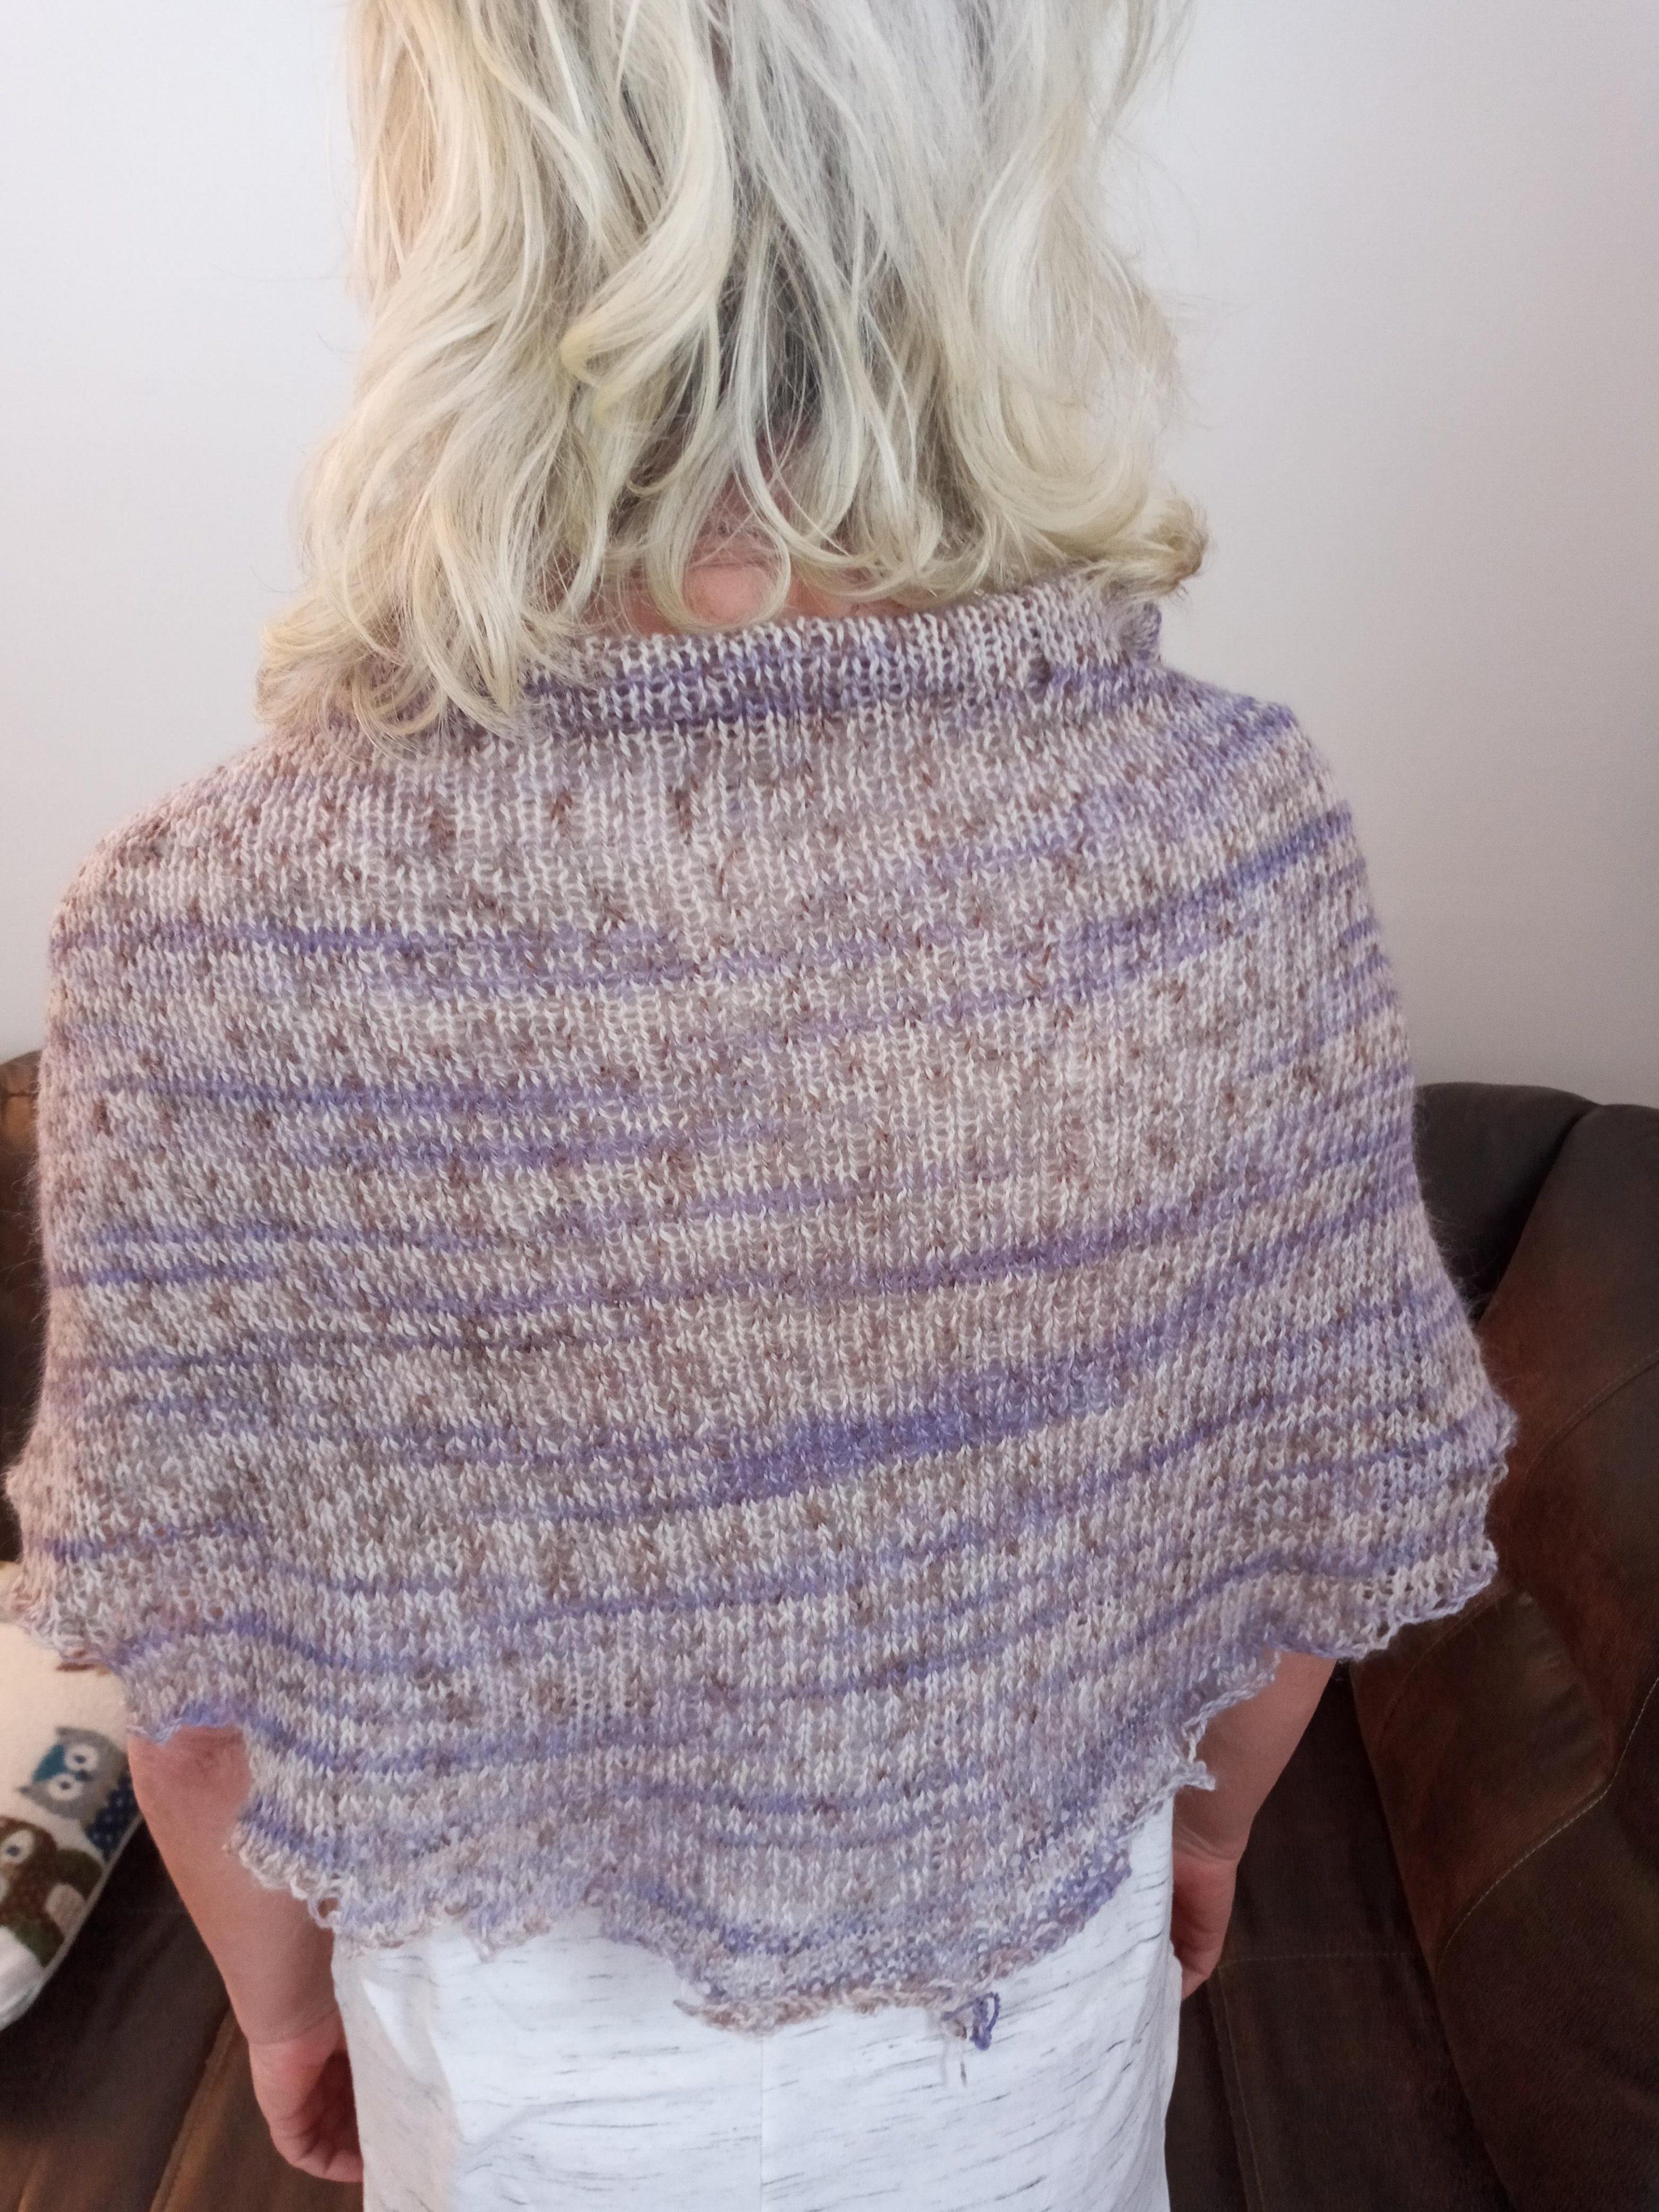 shawl-pattern-by-sylvie-lavoie-2